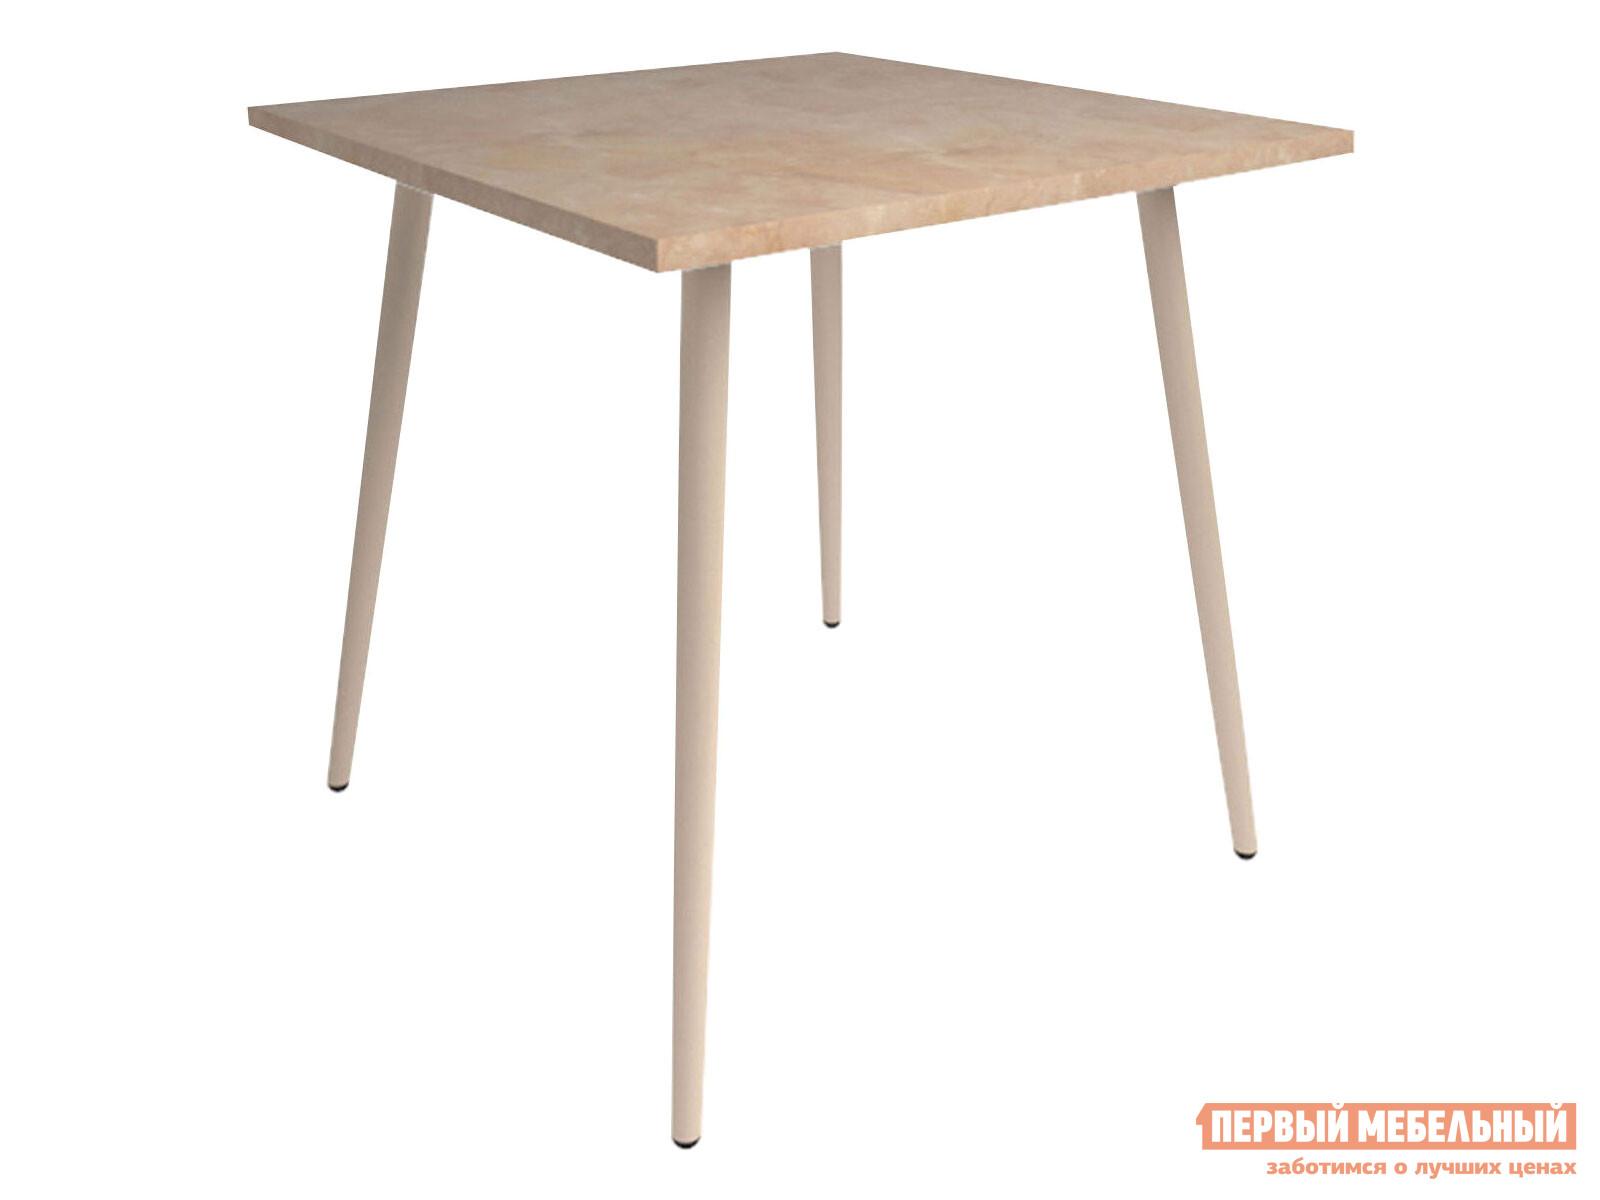 Кухонный стол  Бруно Валенсия / Серо-бежевый, металл Мебвилл 124112